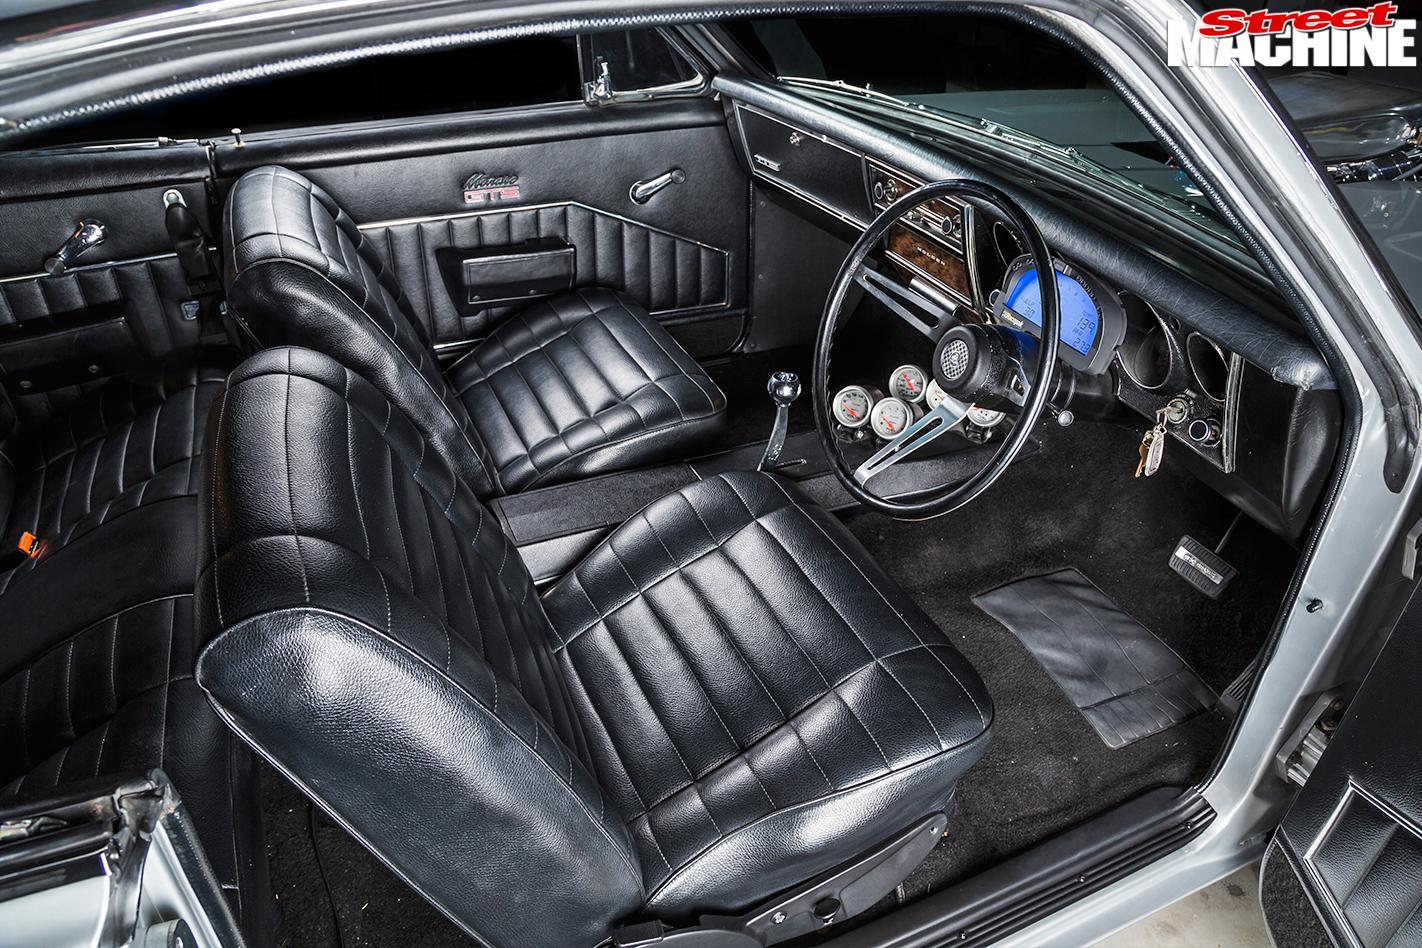 Holden -HG-Monaro -interior -front -2